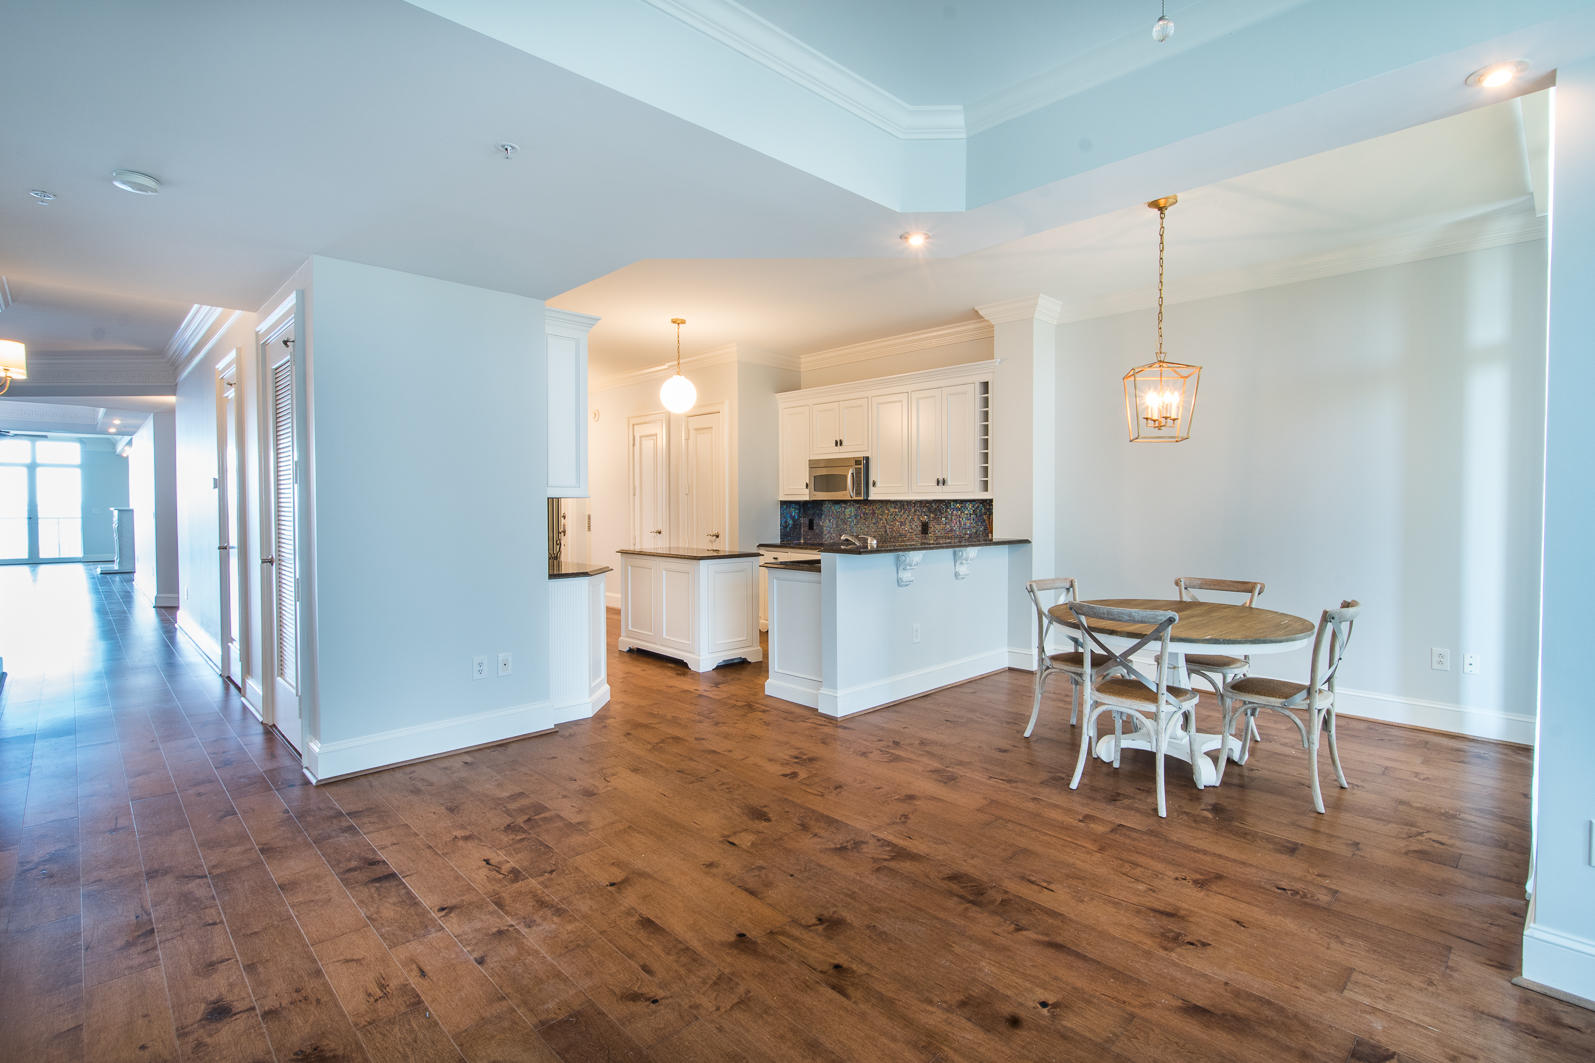 Renaissance On Chas Harbor Homes For Sale - 144 Plaza, Mount Pleasant, SC - 25